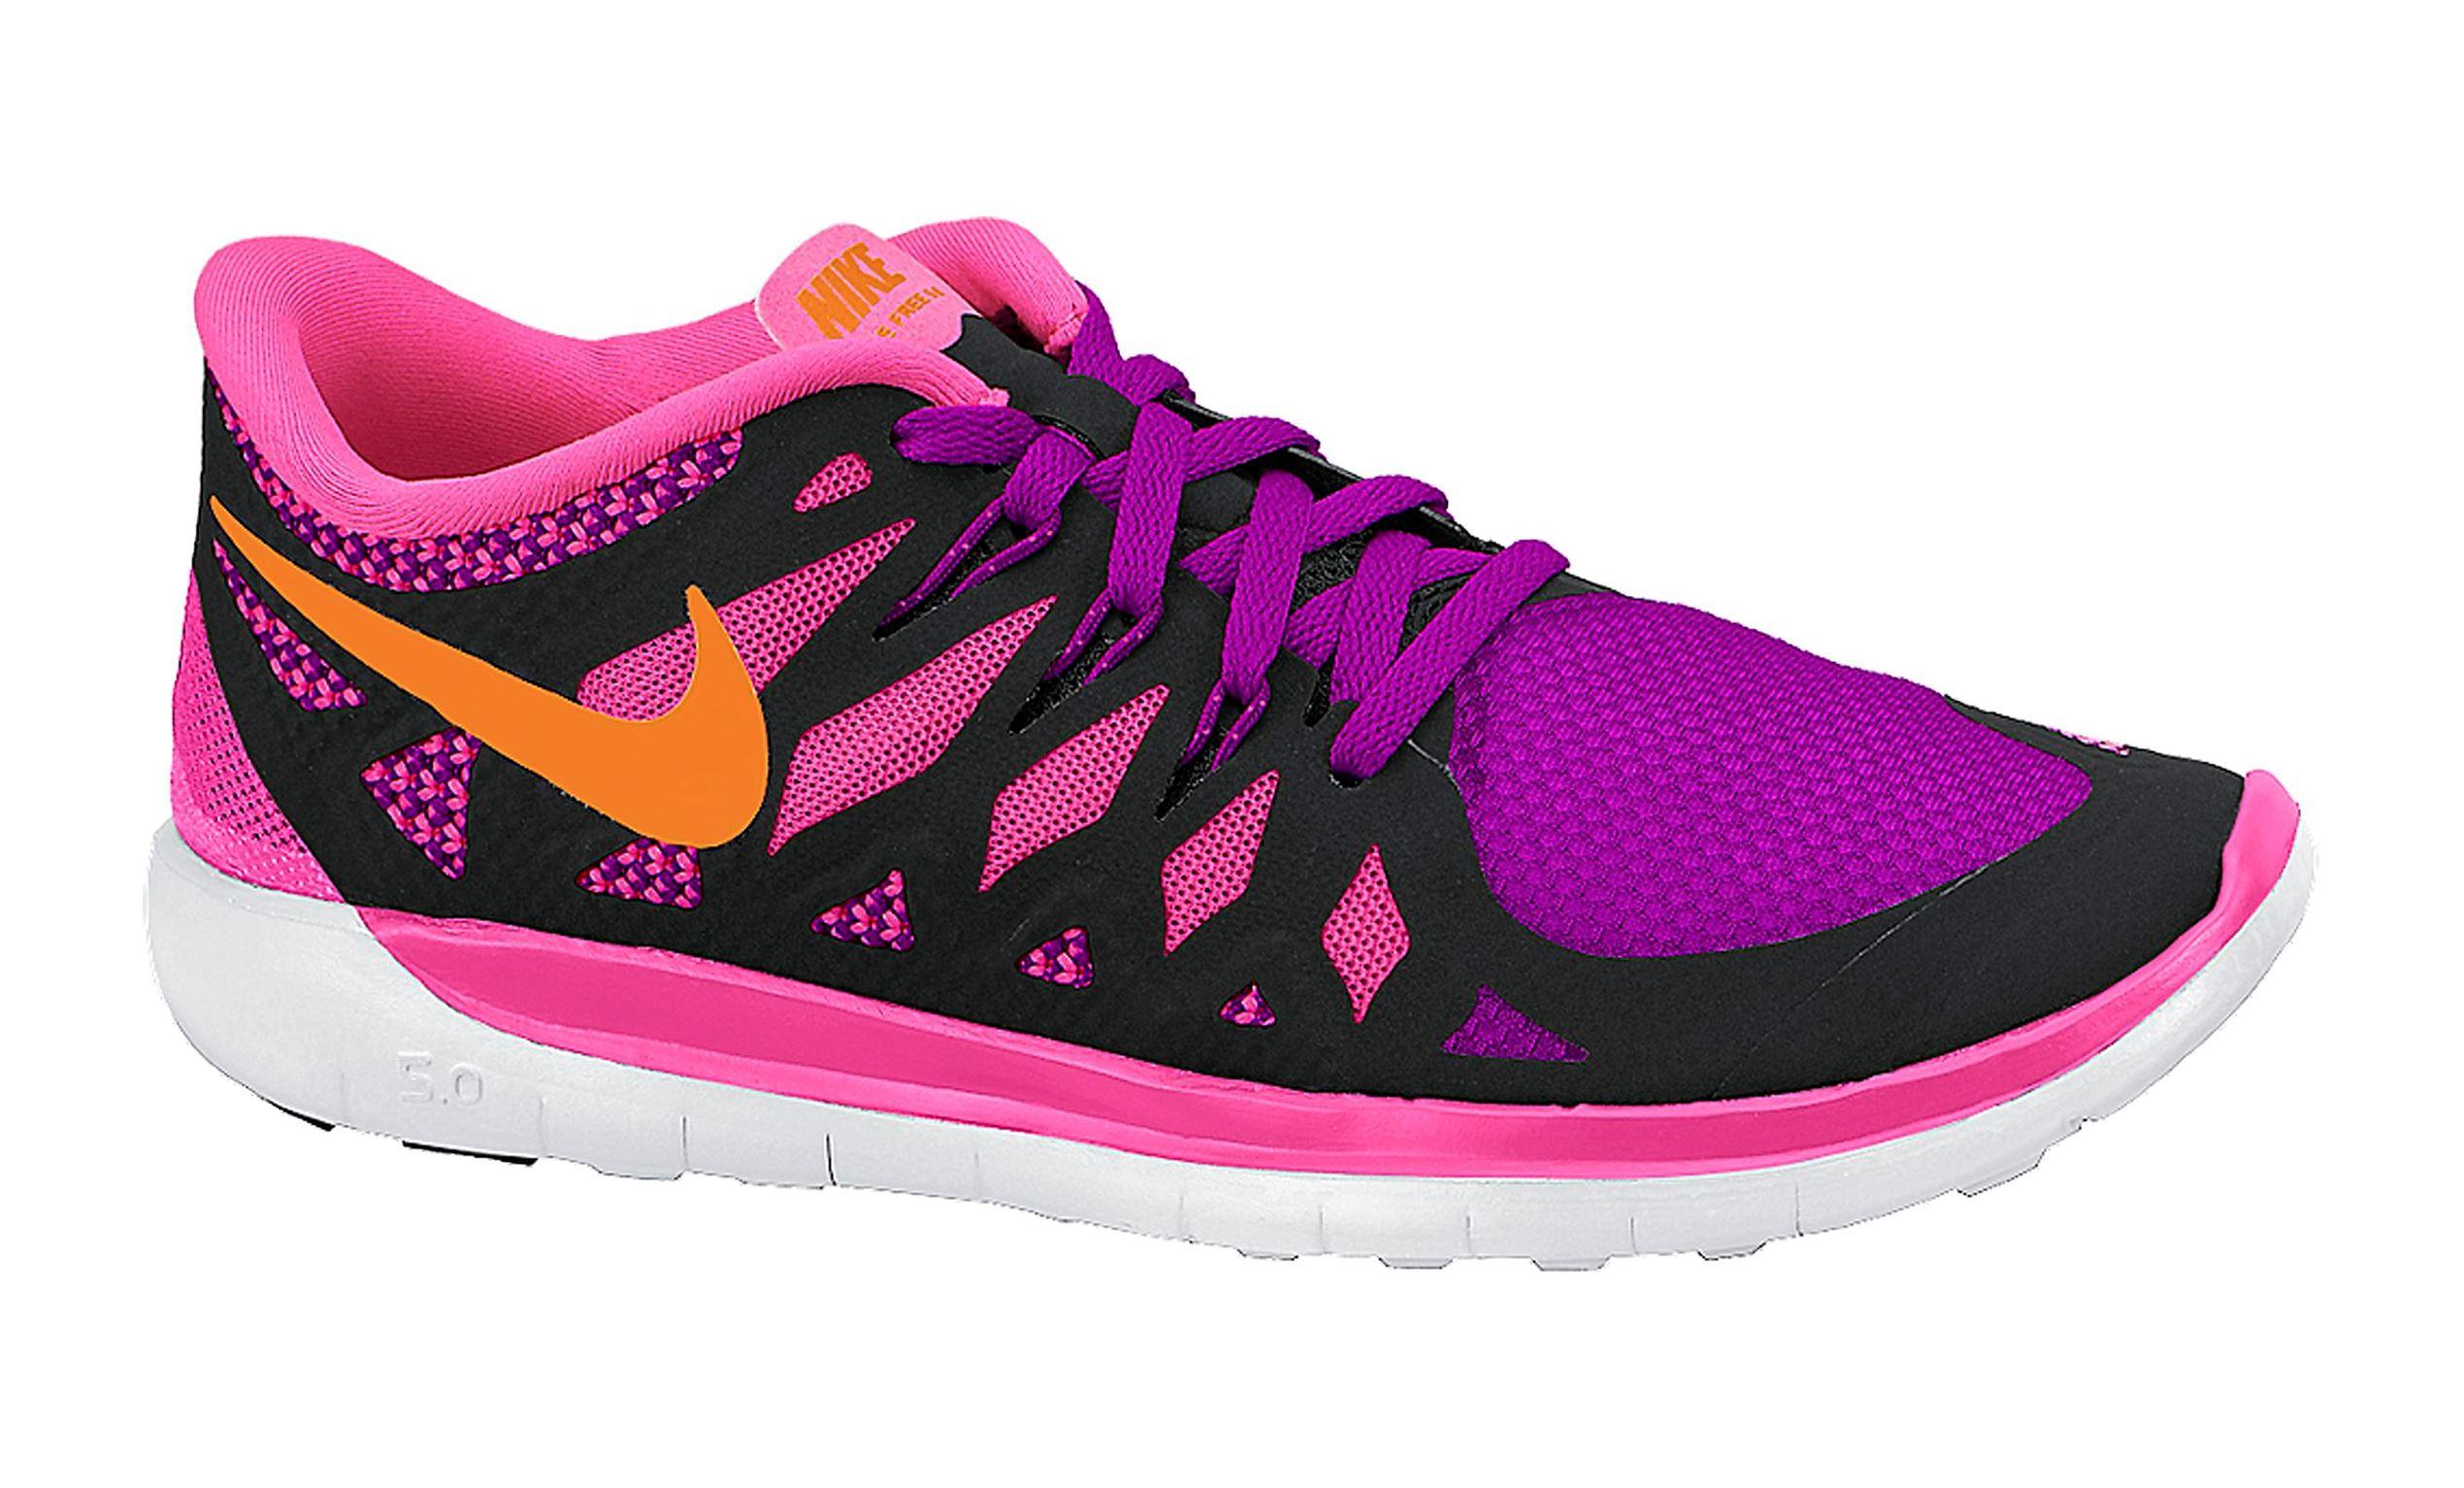 ... Nike Free Run 5.0 - Kids - Anderson and Hill Sportspower ... 8ef425da0a6